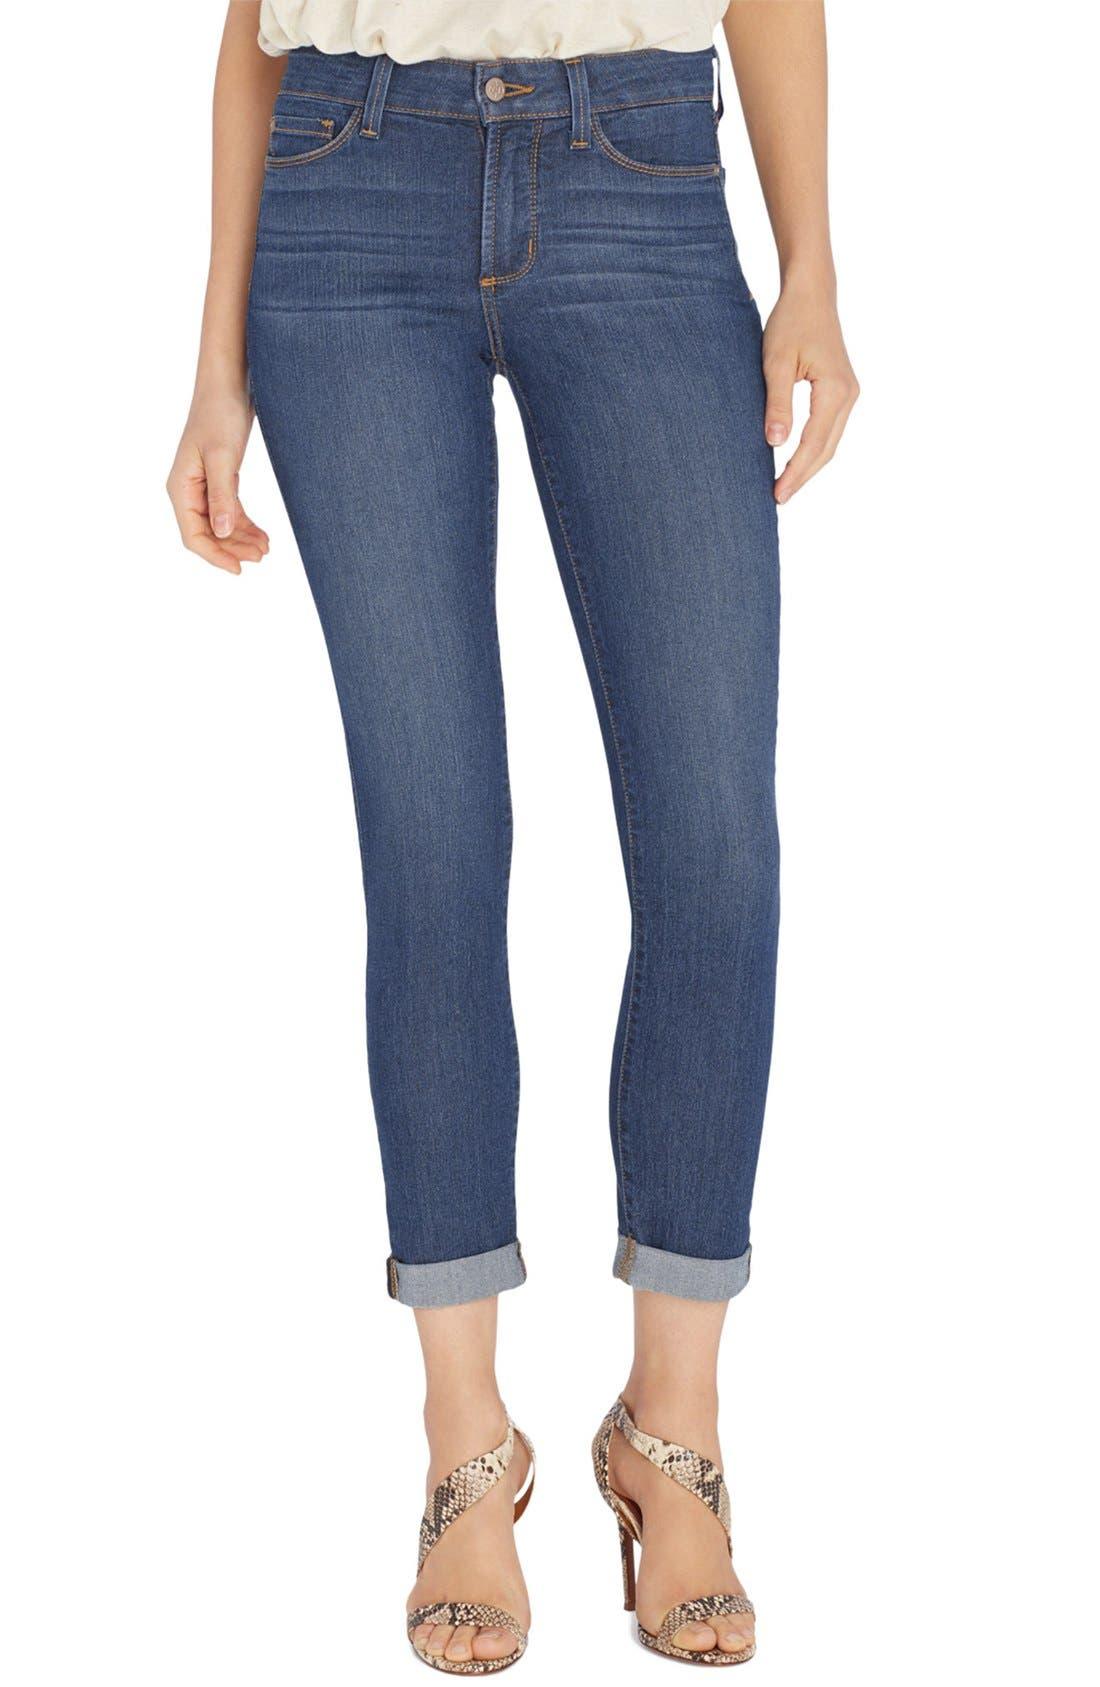 Alternate Image 1 Selected - NYDJ 'Annabelle' Stretch Boyfriend Jeans (Atlanta) (Regular & Petite)